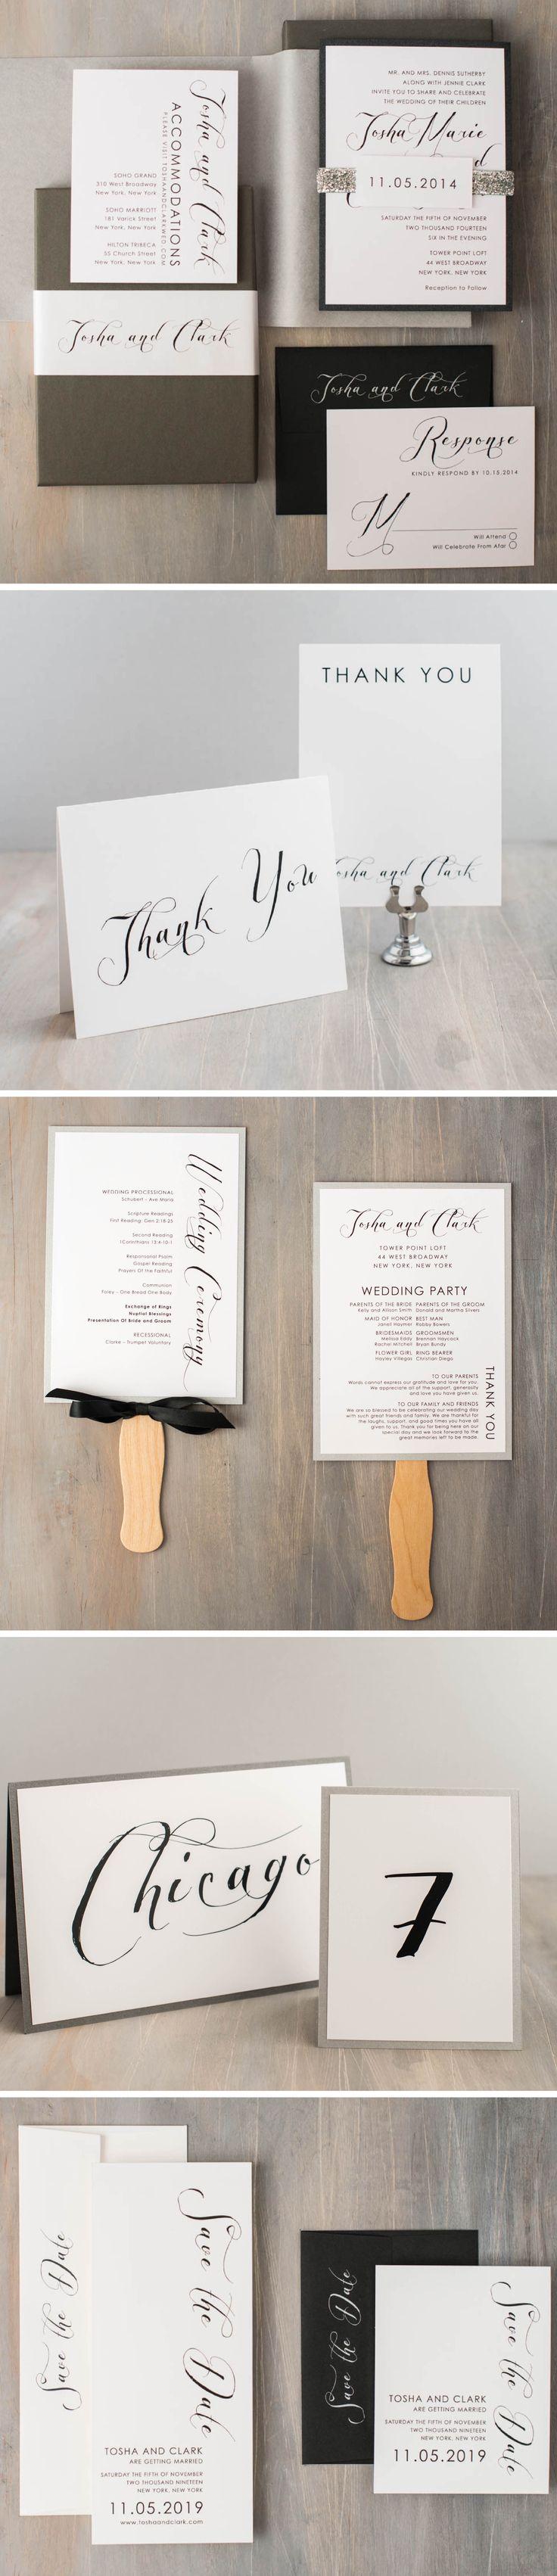 best 25 box wedding invitations ideas on pinterest box